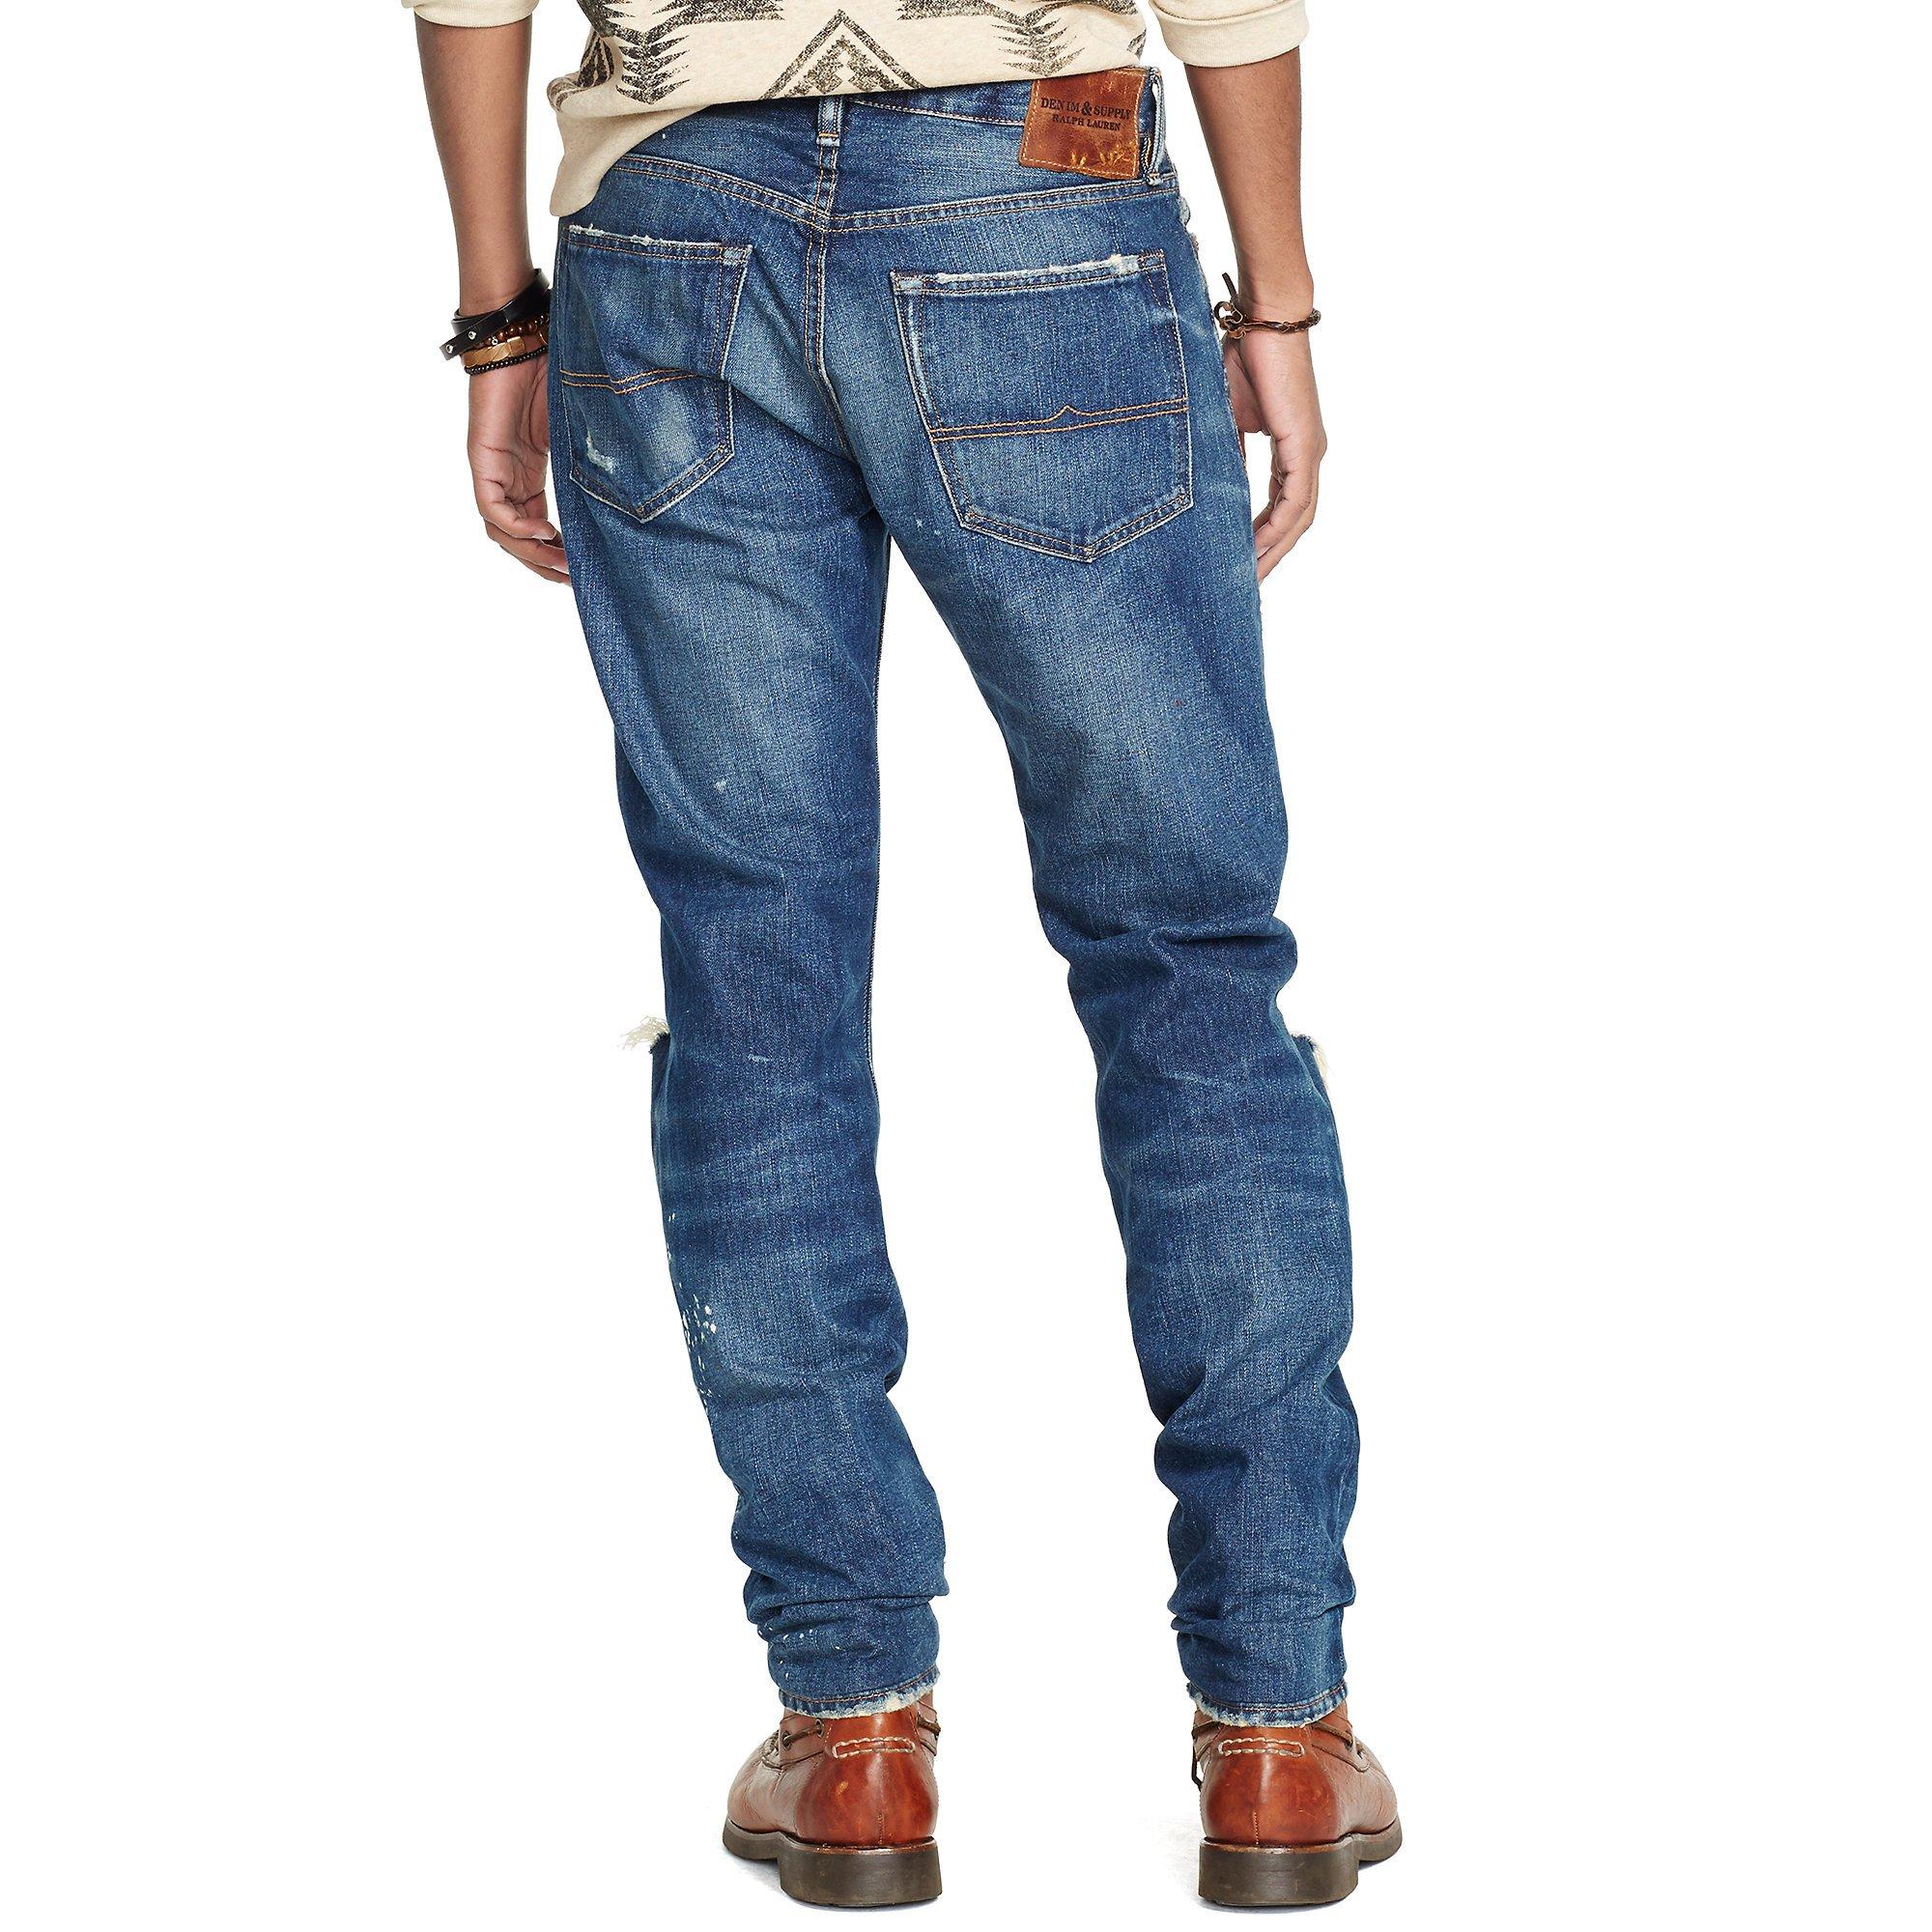 denim supply ralph lauren tapered straight dylan jean in blue for men lyst. Black Bedroom Furniture Sets. Home Design Ideas